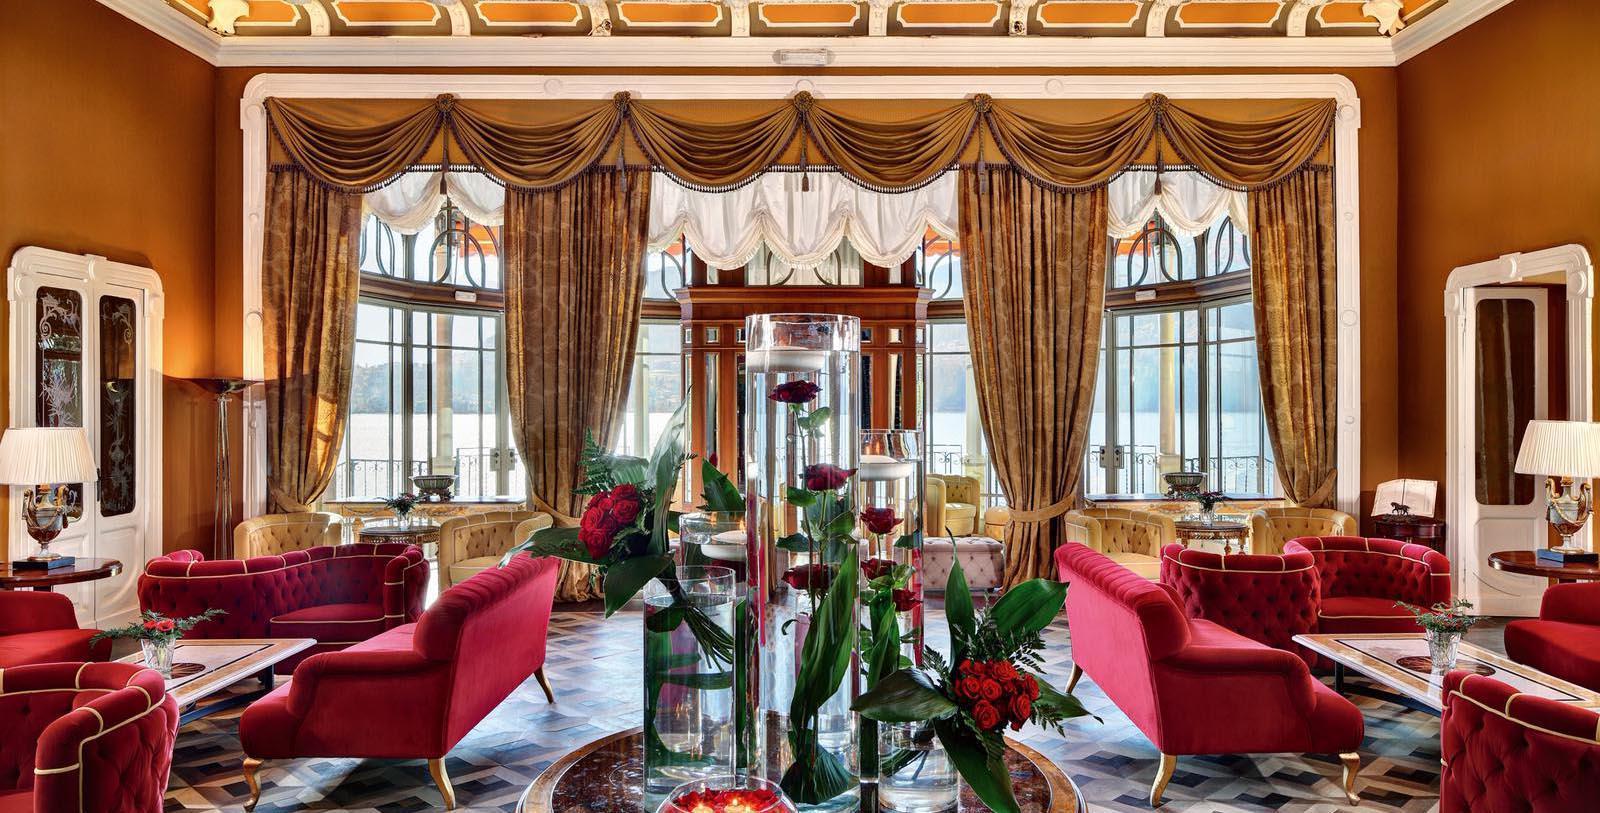 Image of Lobby Seating, Grand Hotel Tremezzo, Lake Como, Italy, 1910, Member of Historic Hotels Worldwide, Experience